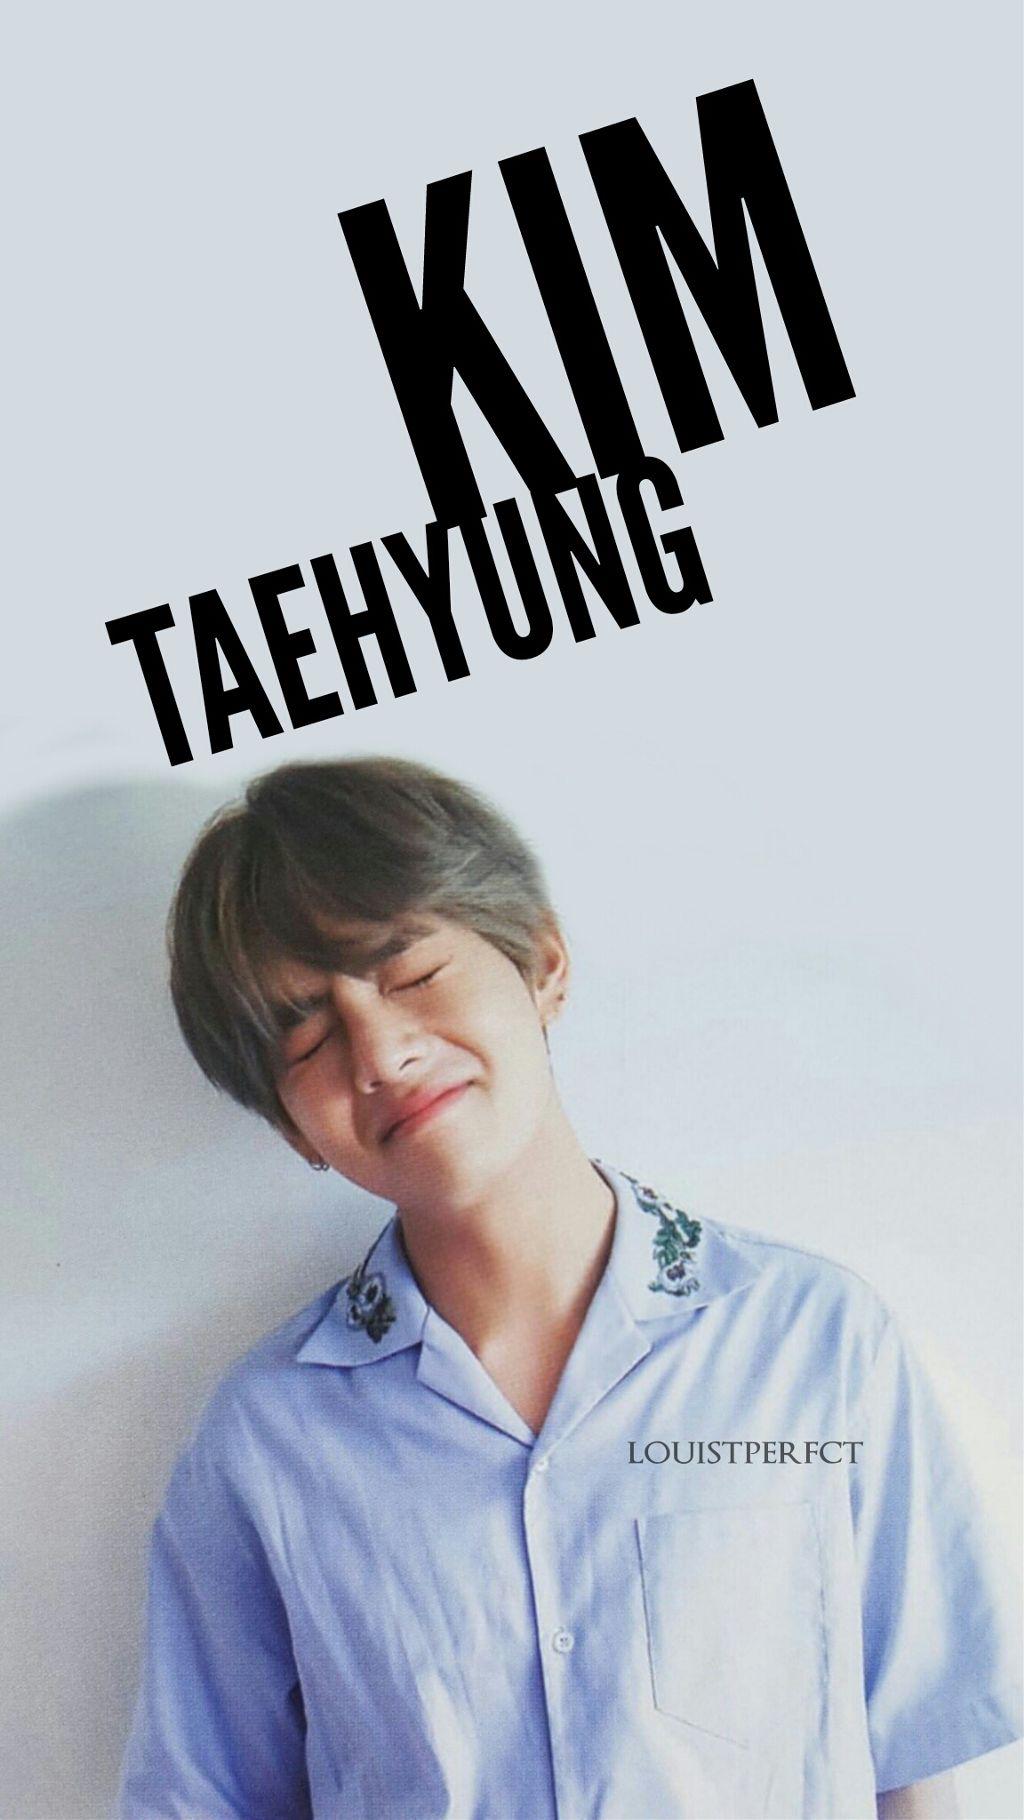 Bts Kimtaehyung V Taehyung Lockscreen Wallpaper